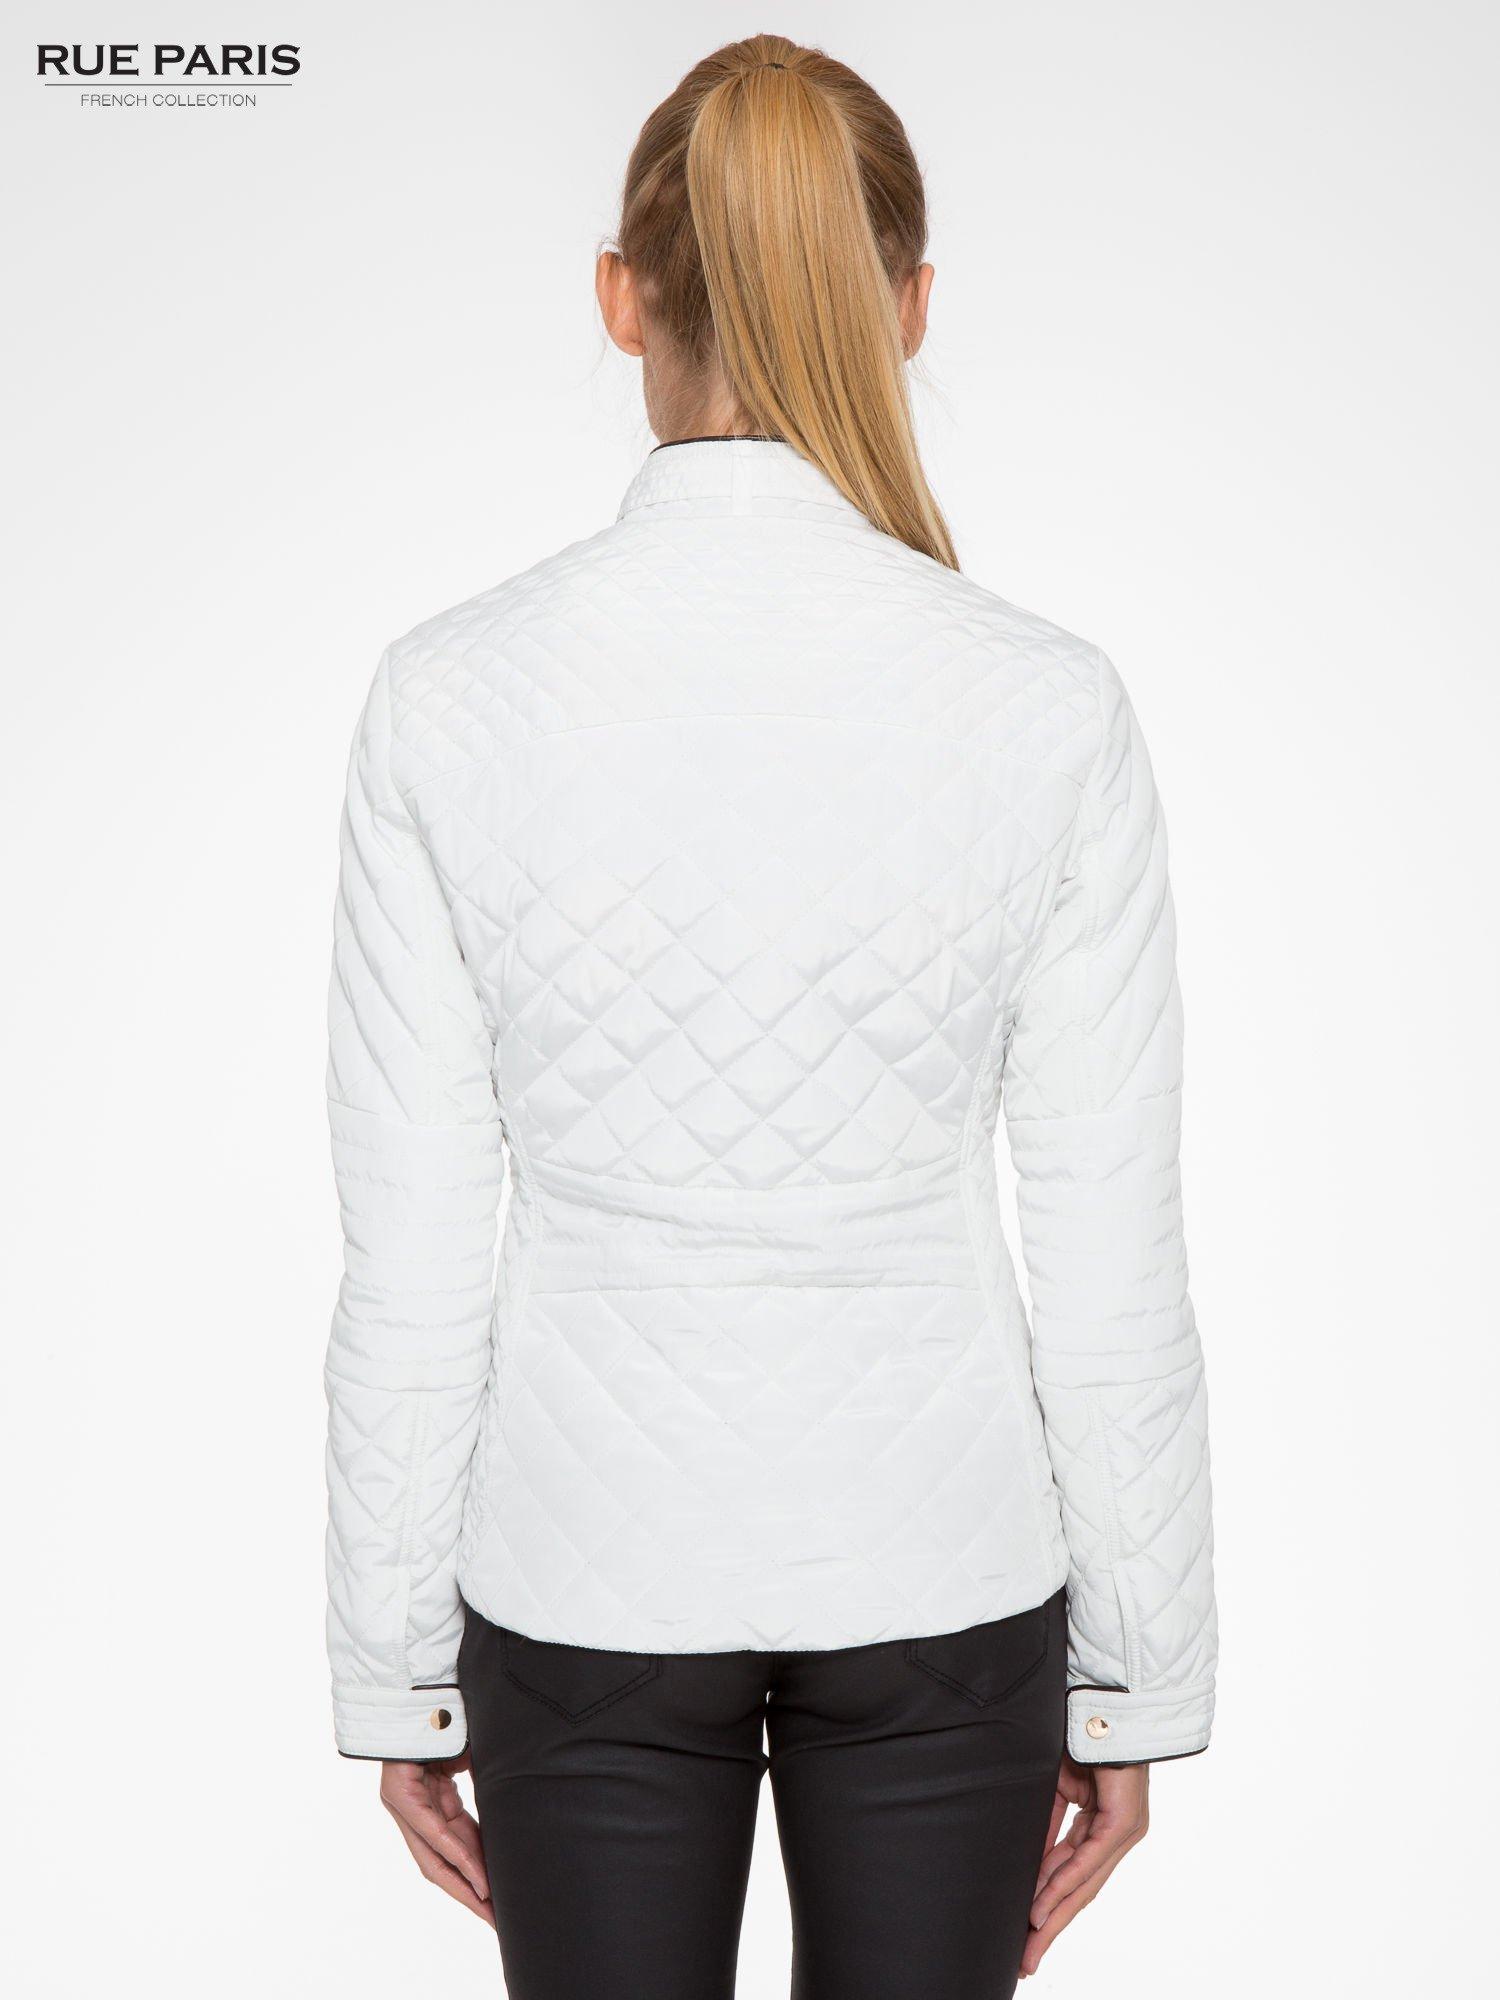 Biała pikowana kurtka ze skórzaną lamówką                                  zdj.                                  4